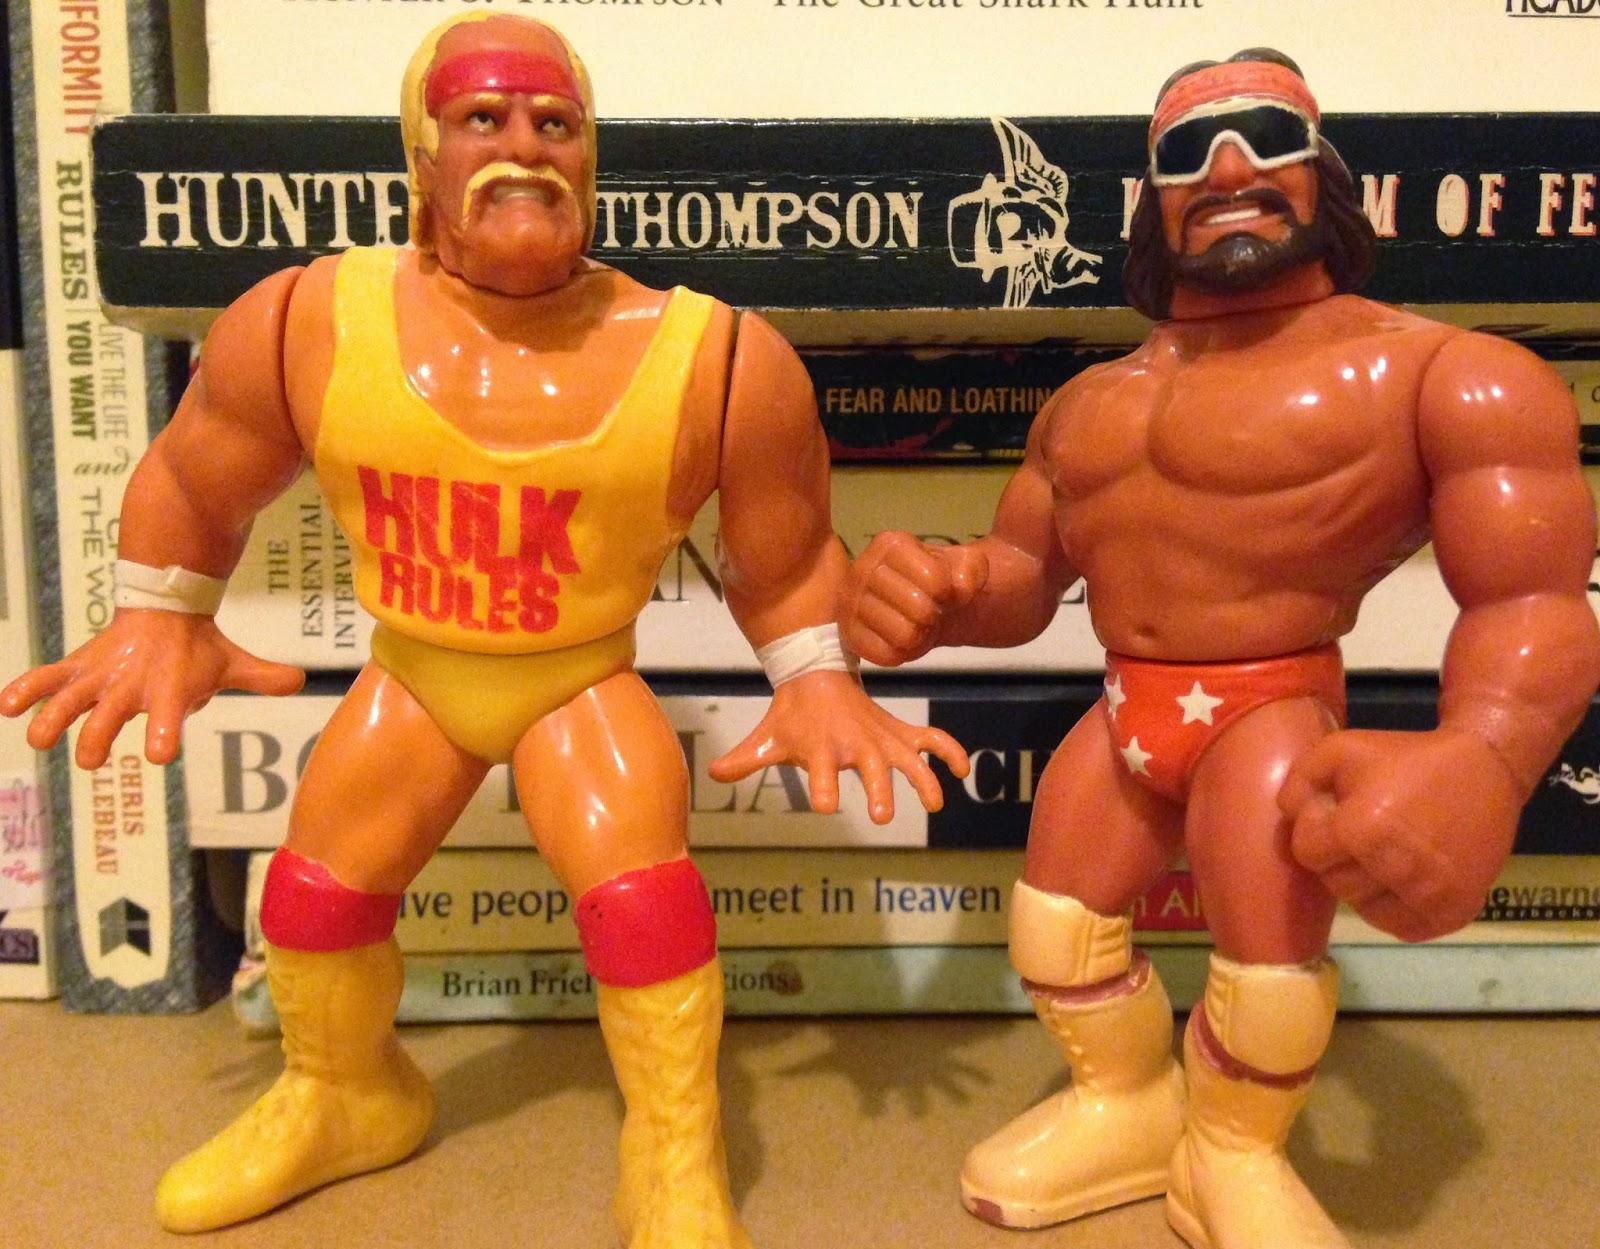 WWF / WWE - Hasbro Wrestling Figures - Macho Man Randy Savage vs.Hulk Hogan - The Mega Powers Explode at Wrestlemania 5